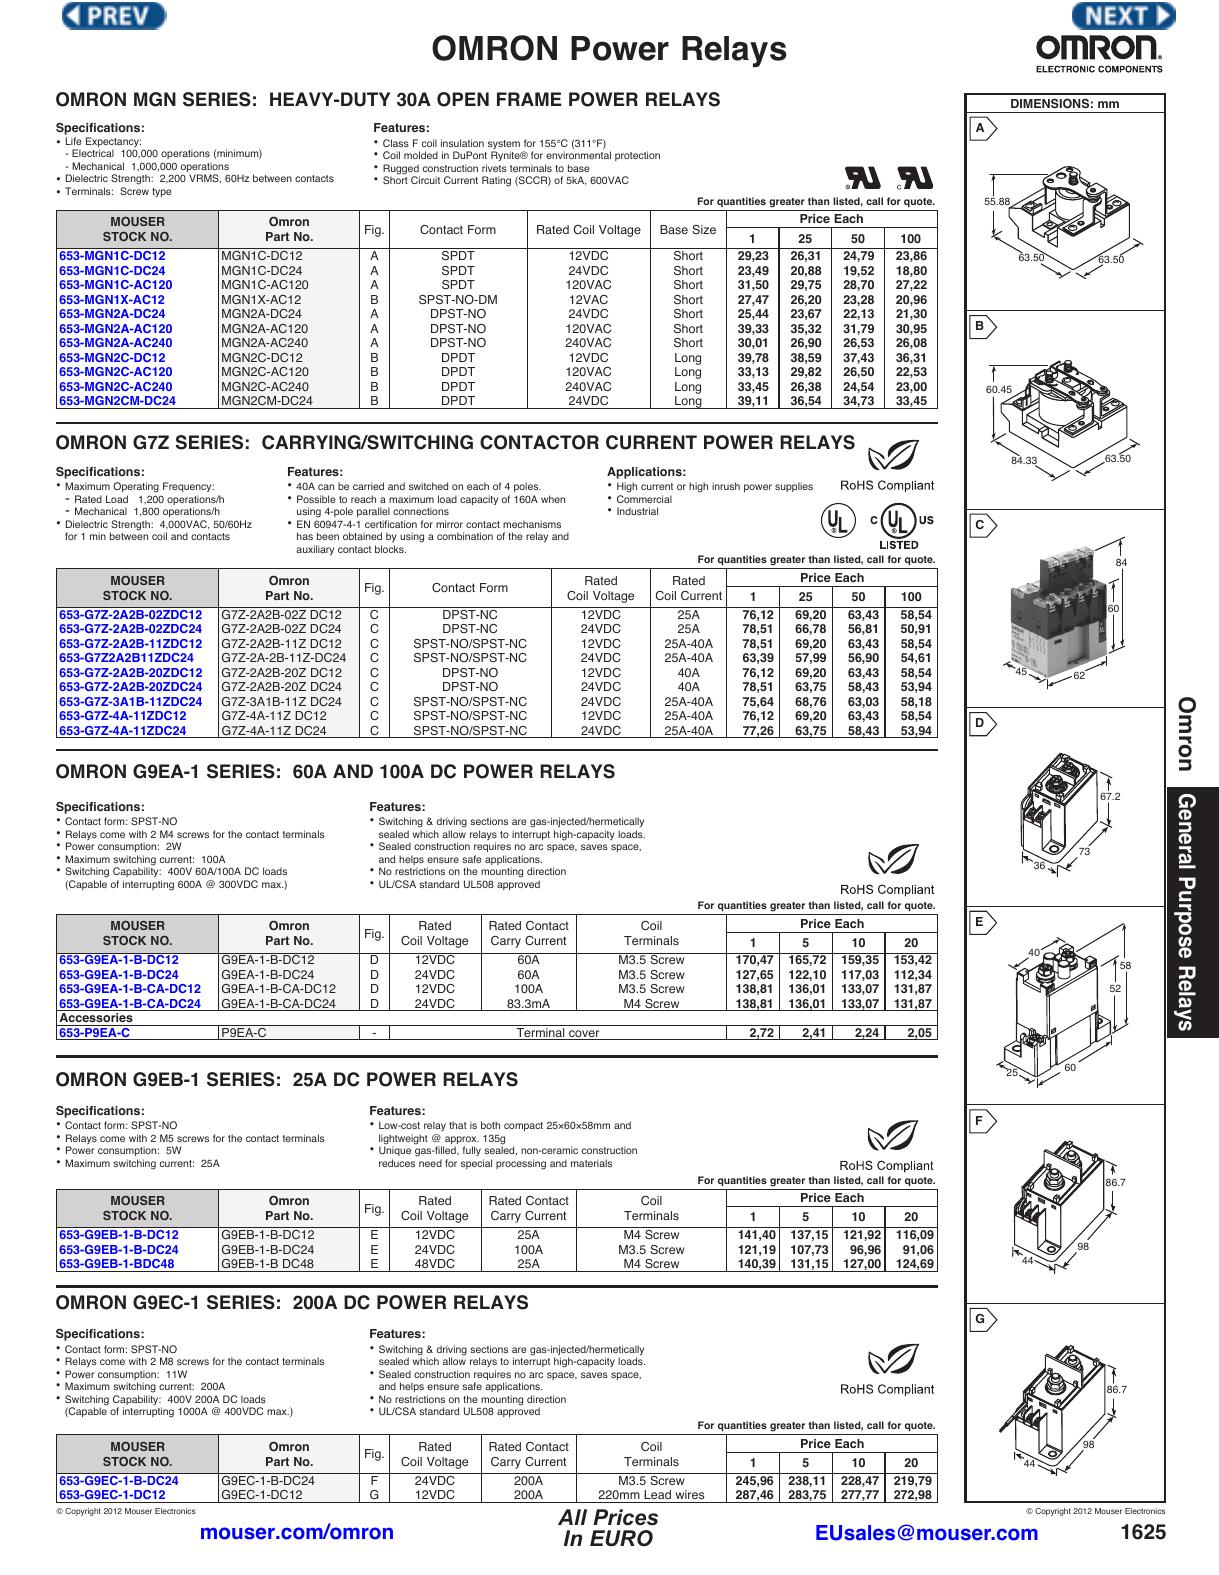 OMRON Power Relays - Mouser Electronics | manualzz com